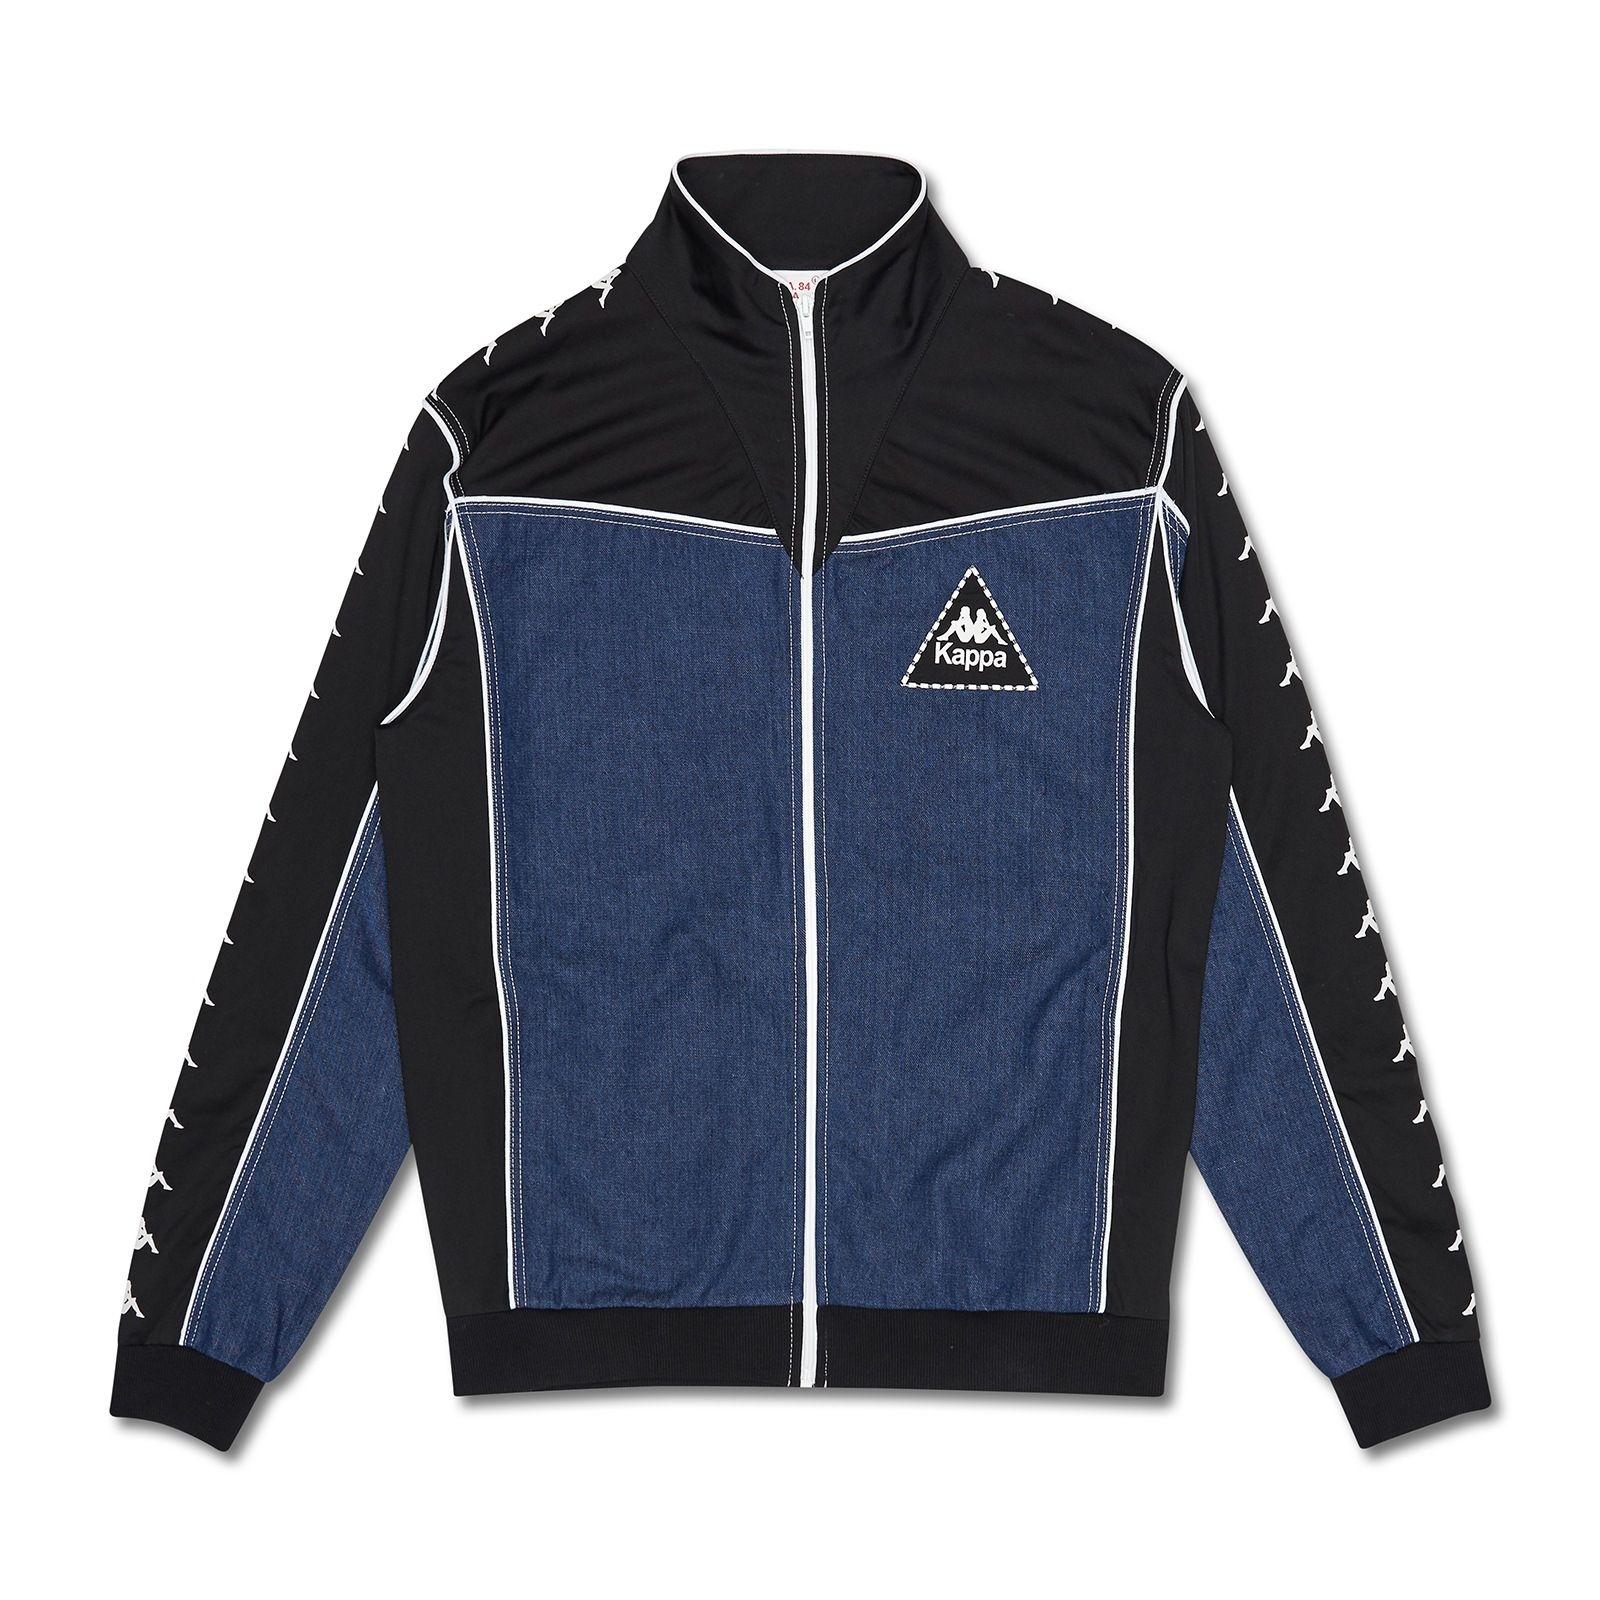 Kappa Kontroll La Denim Jacket Blue Navy | tracksuits